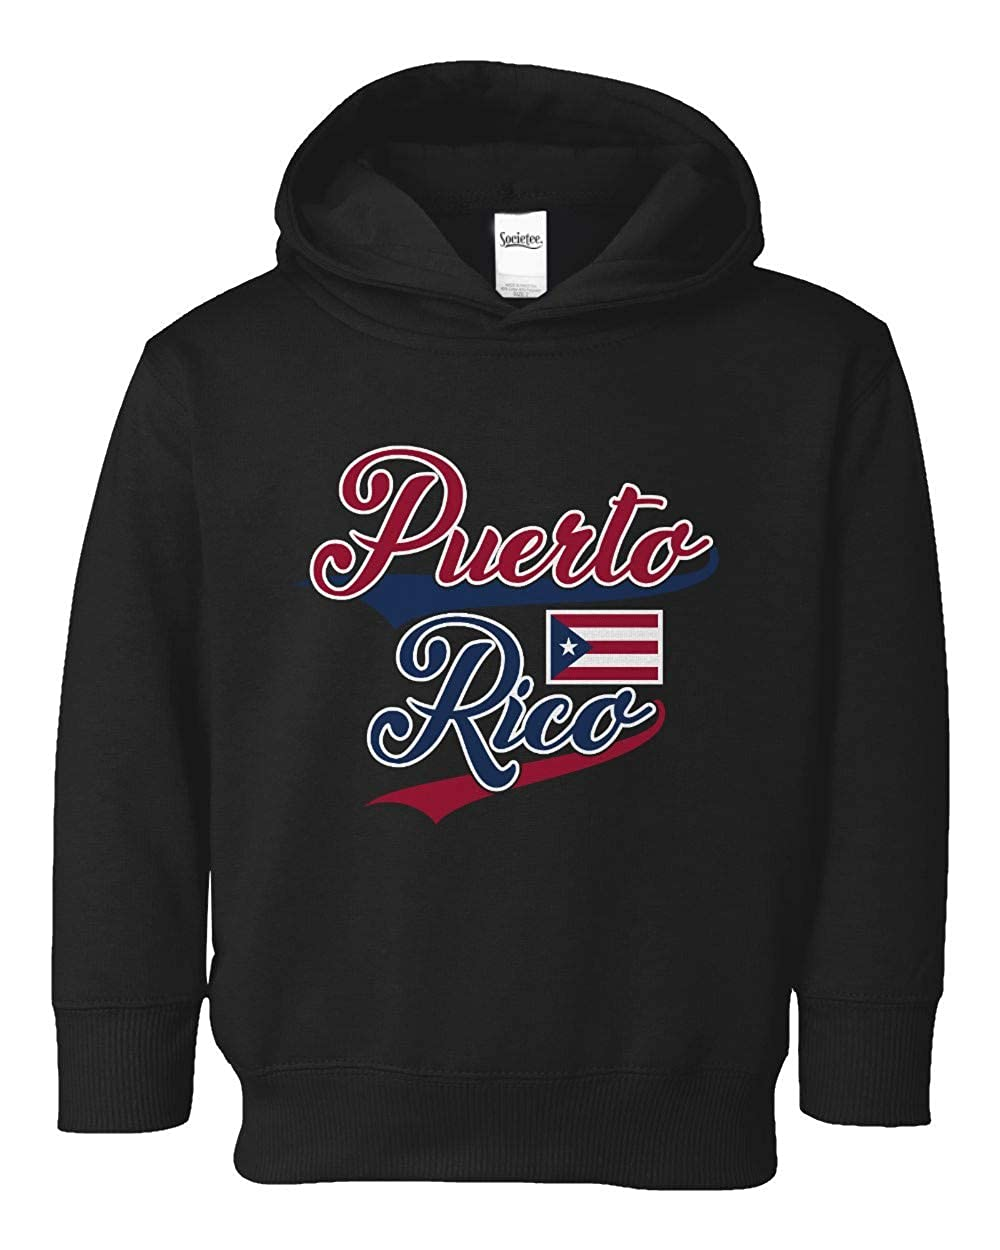 Societee Team Puerto Rico Girls Boys Toddler Hooded Sweatshirt